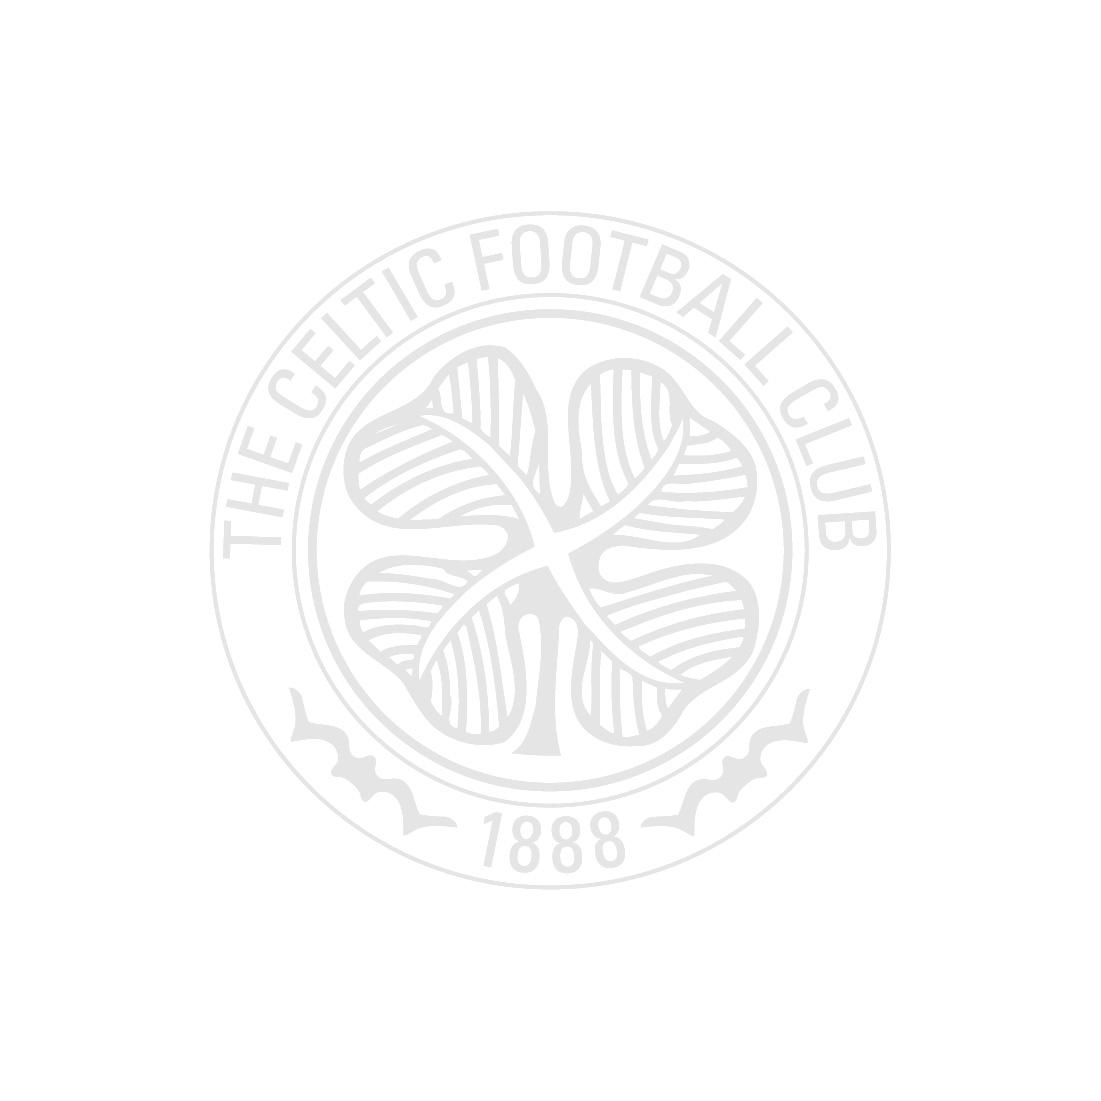 Celtic Crest Silicon Cover Wireless Earphones